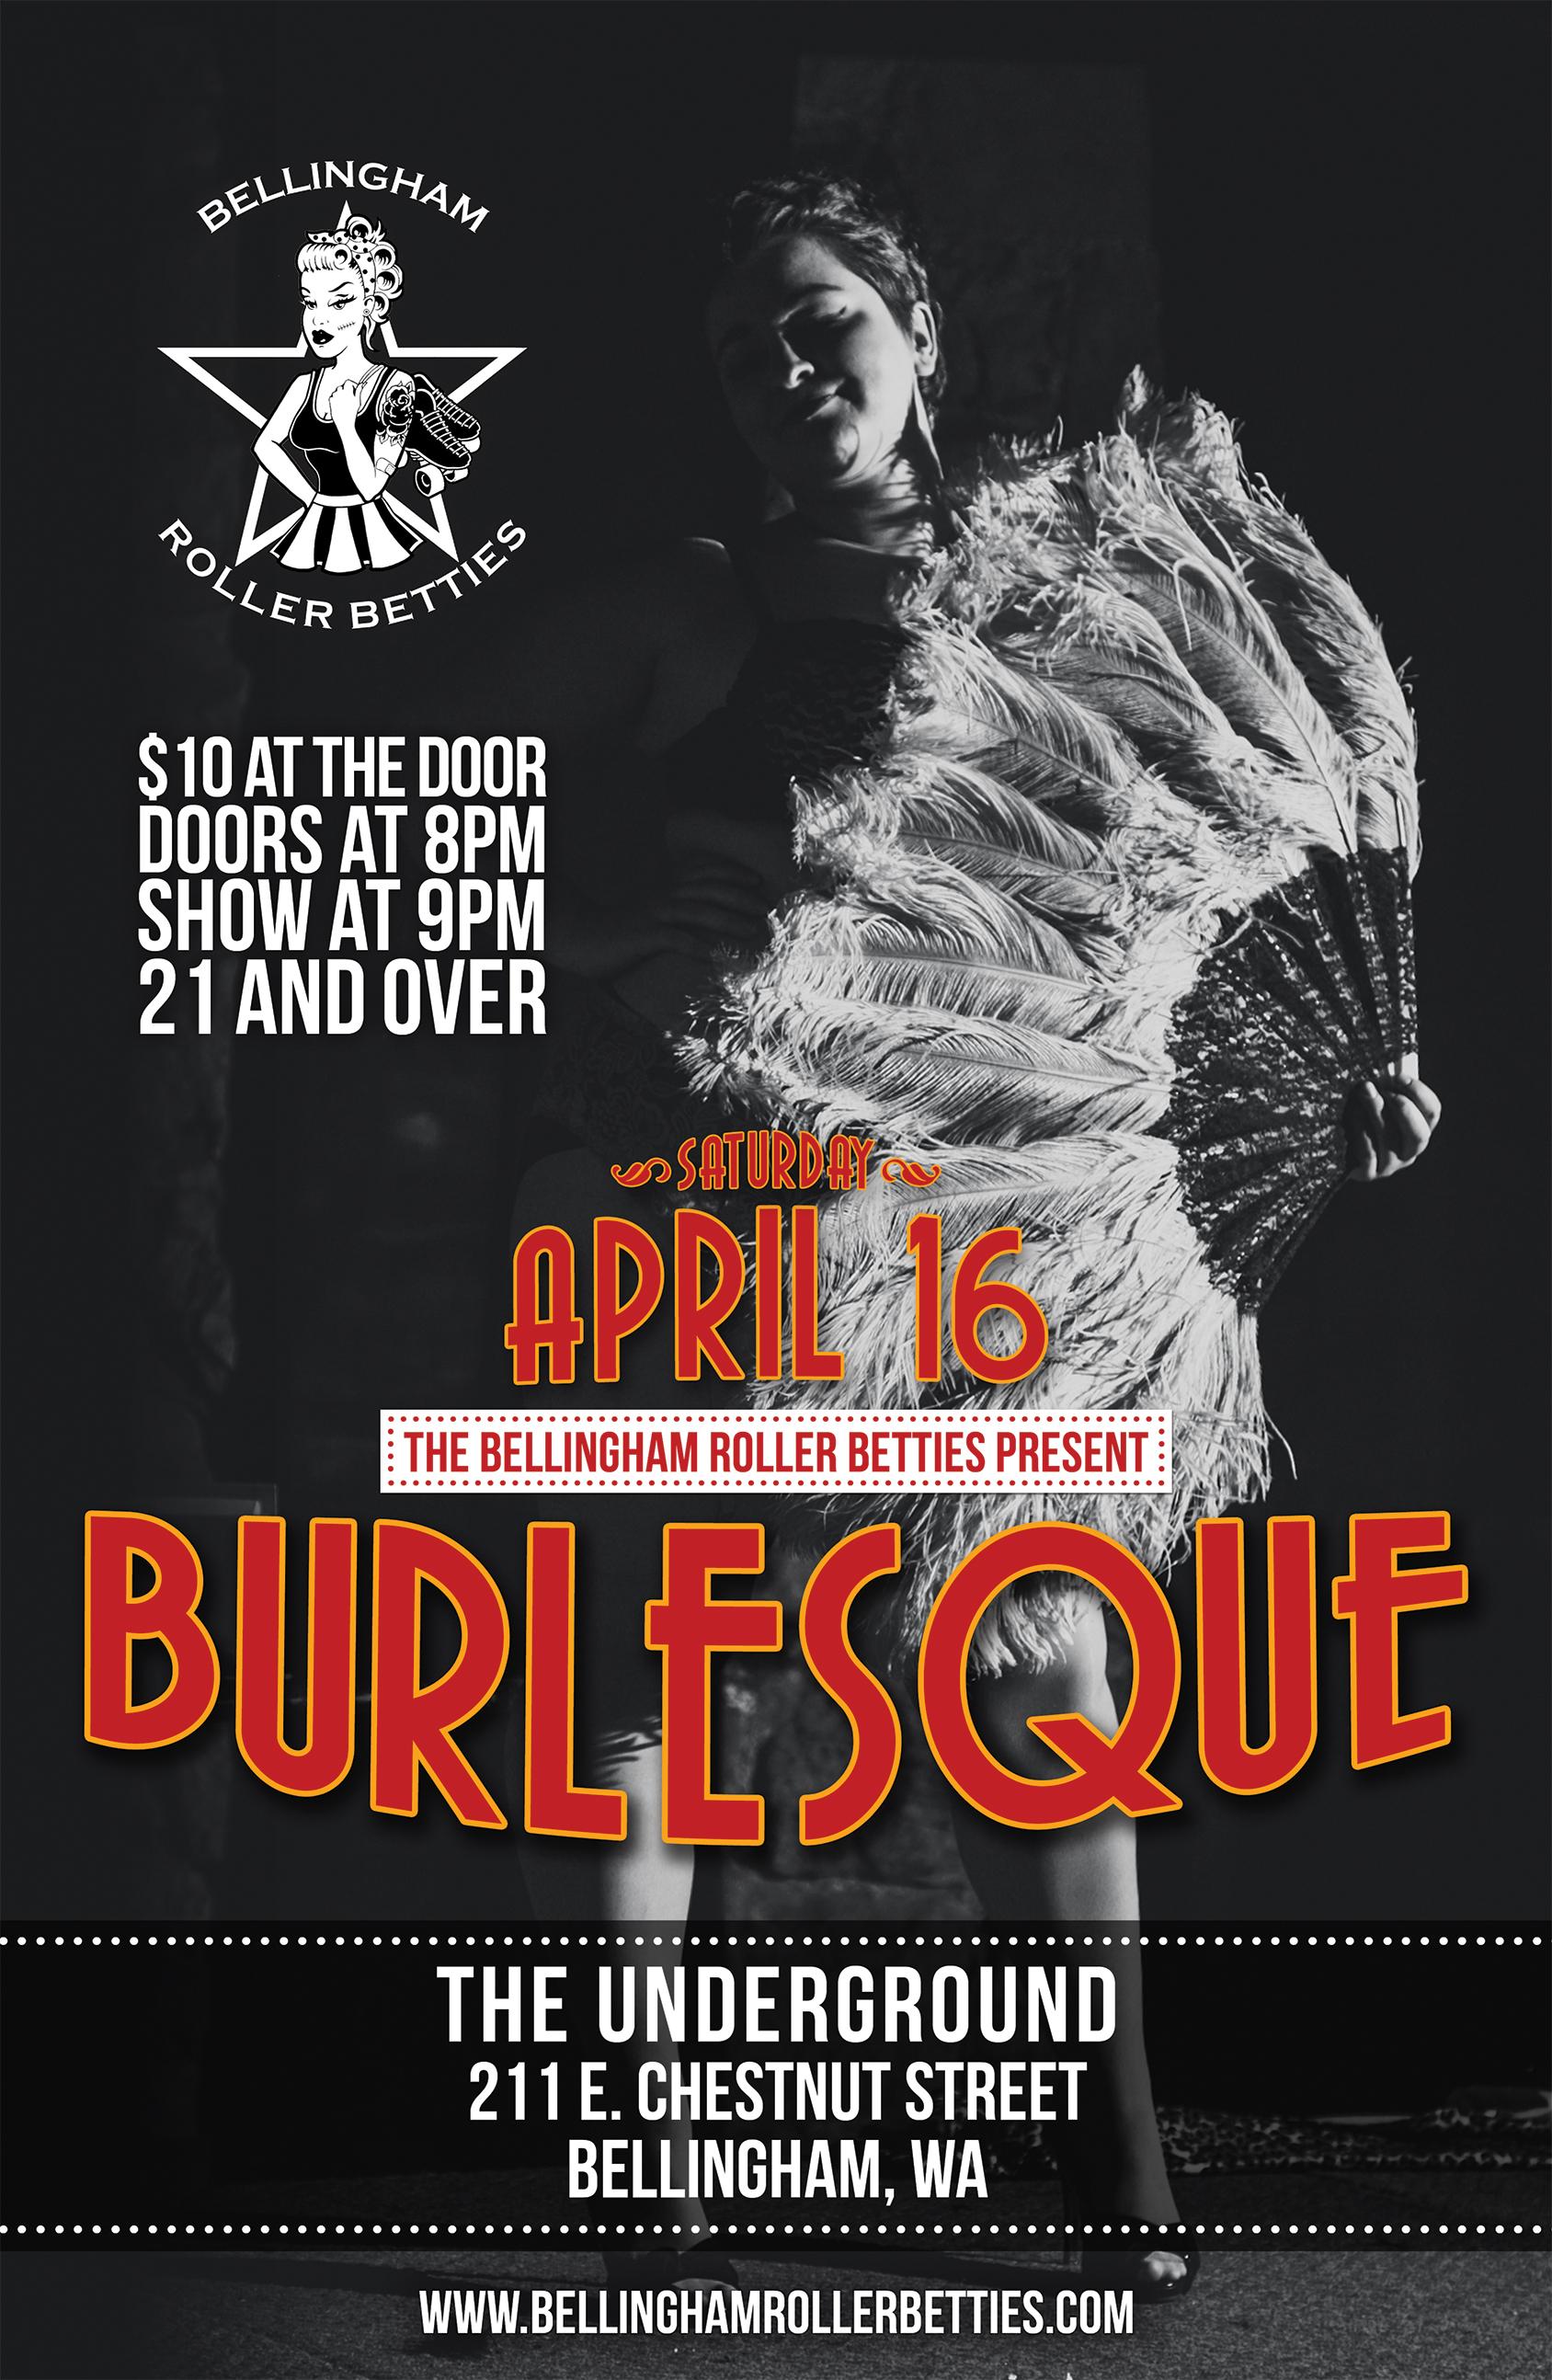 burlesque2016.jpg